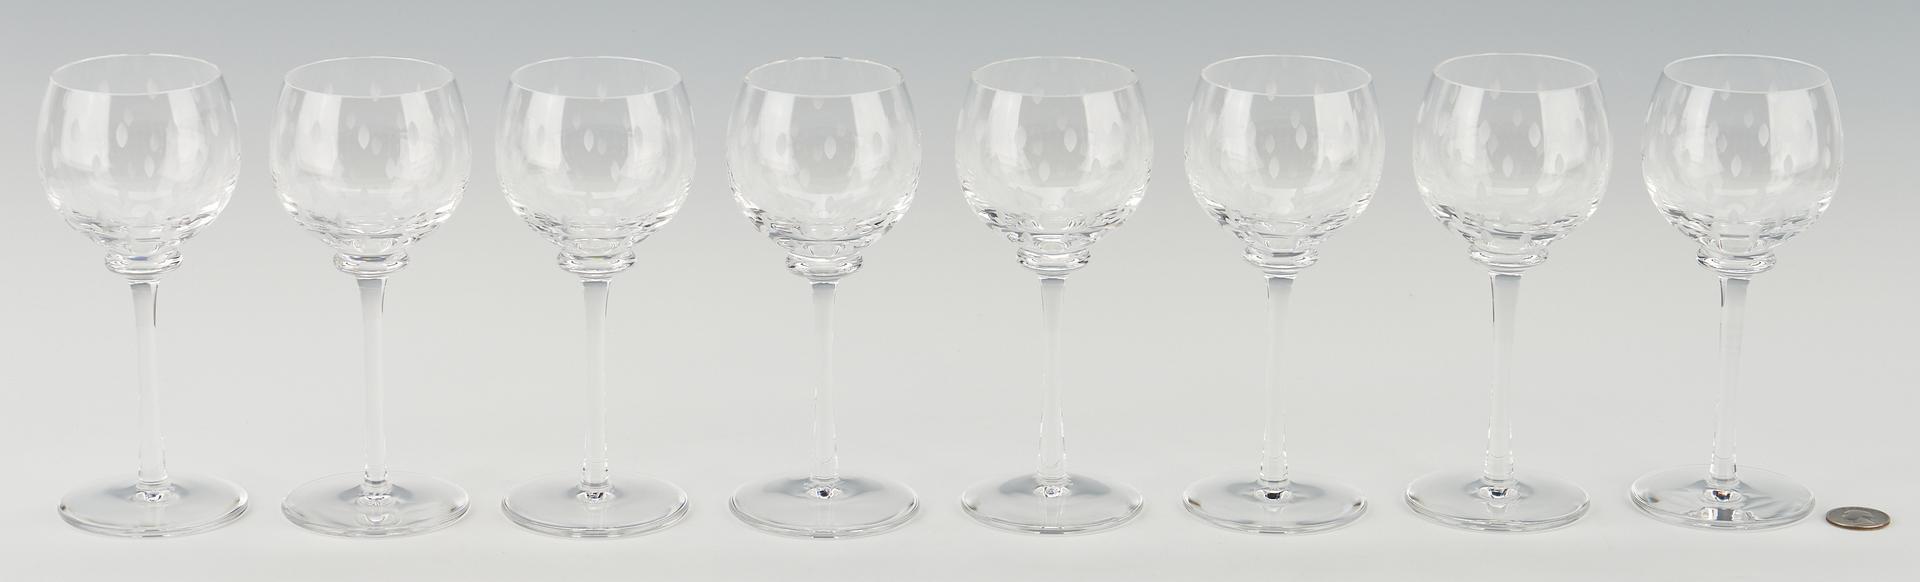 Lot 551: 16 Hermes Crystal Fanfare Wine Glasses w/ Boxes